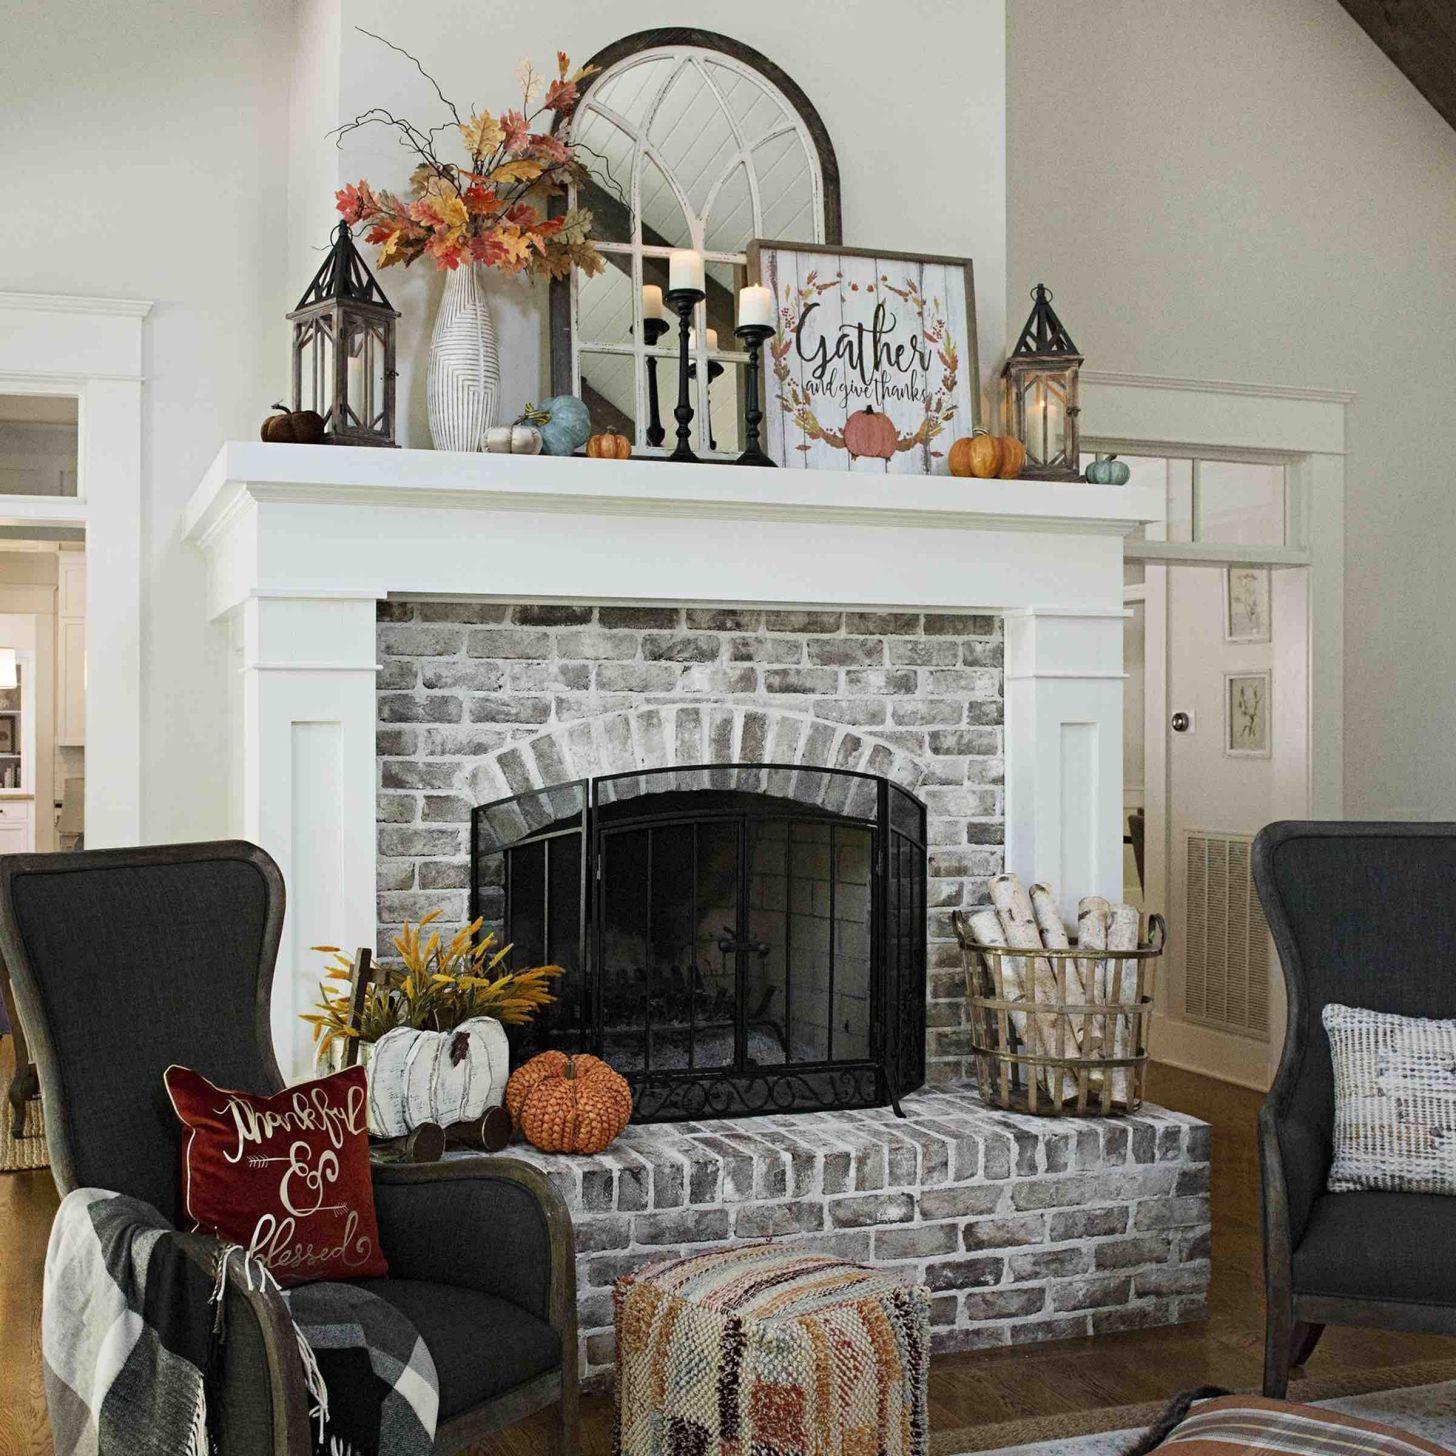 10+ Beautiful Farmhouse Fireplace Mantel Decorations That